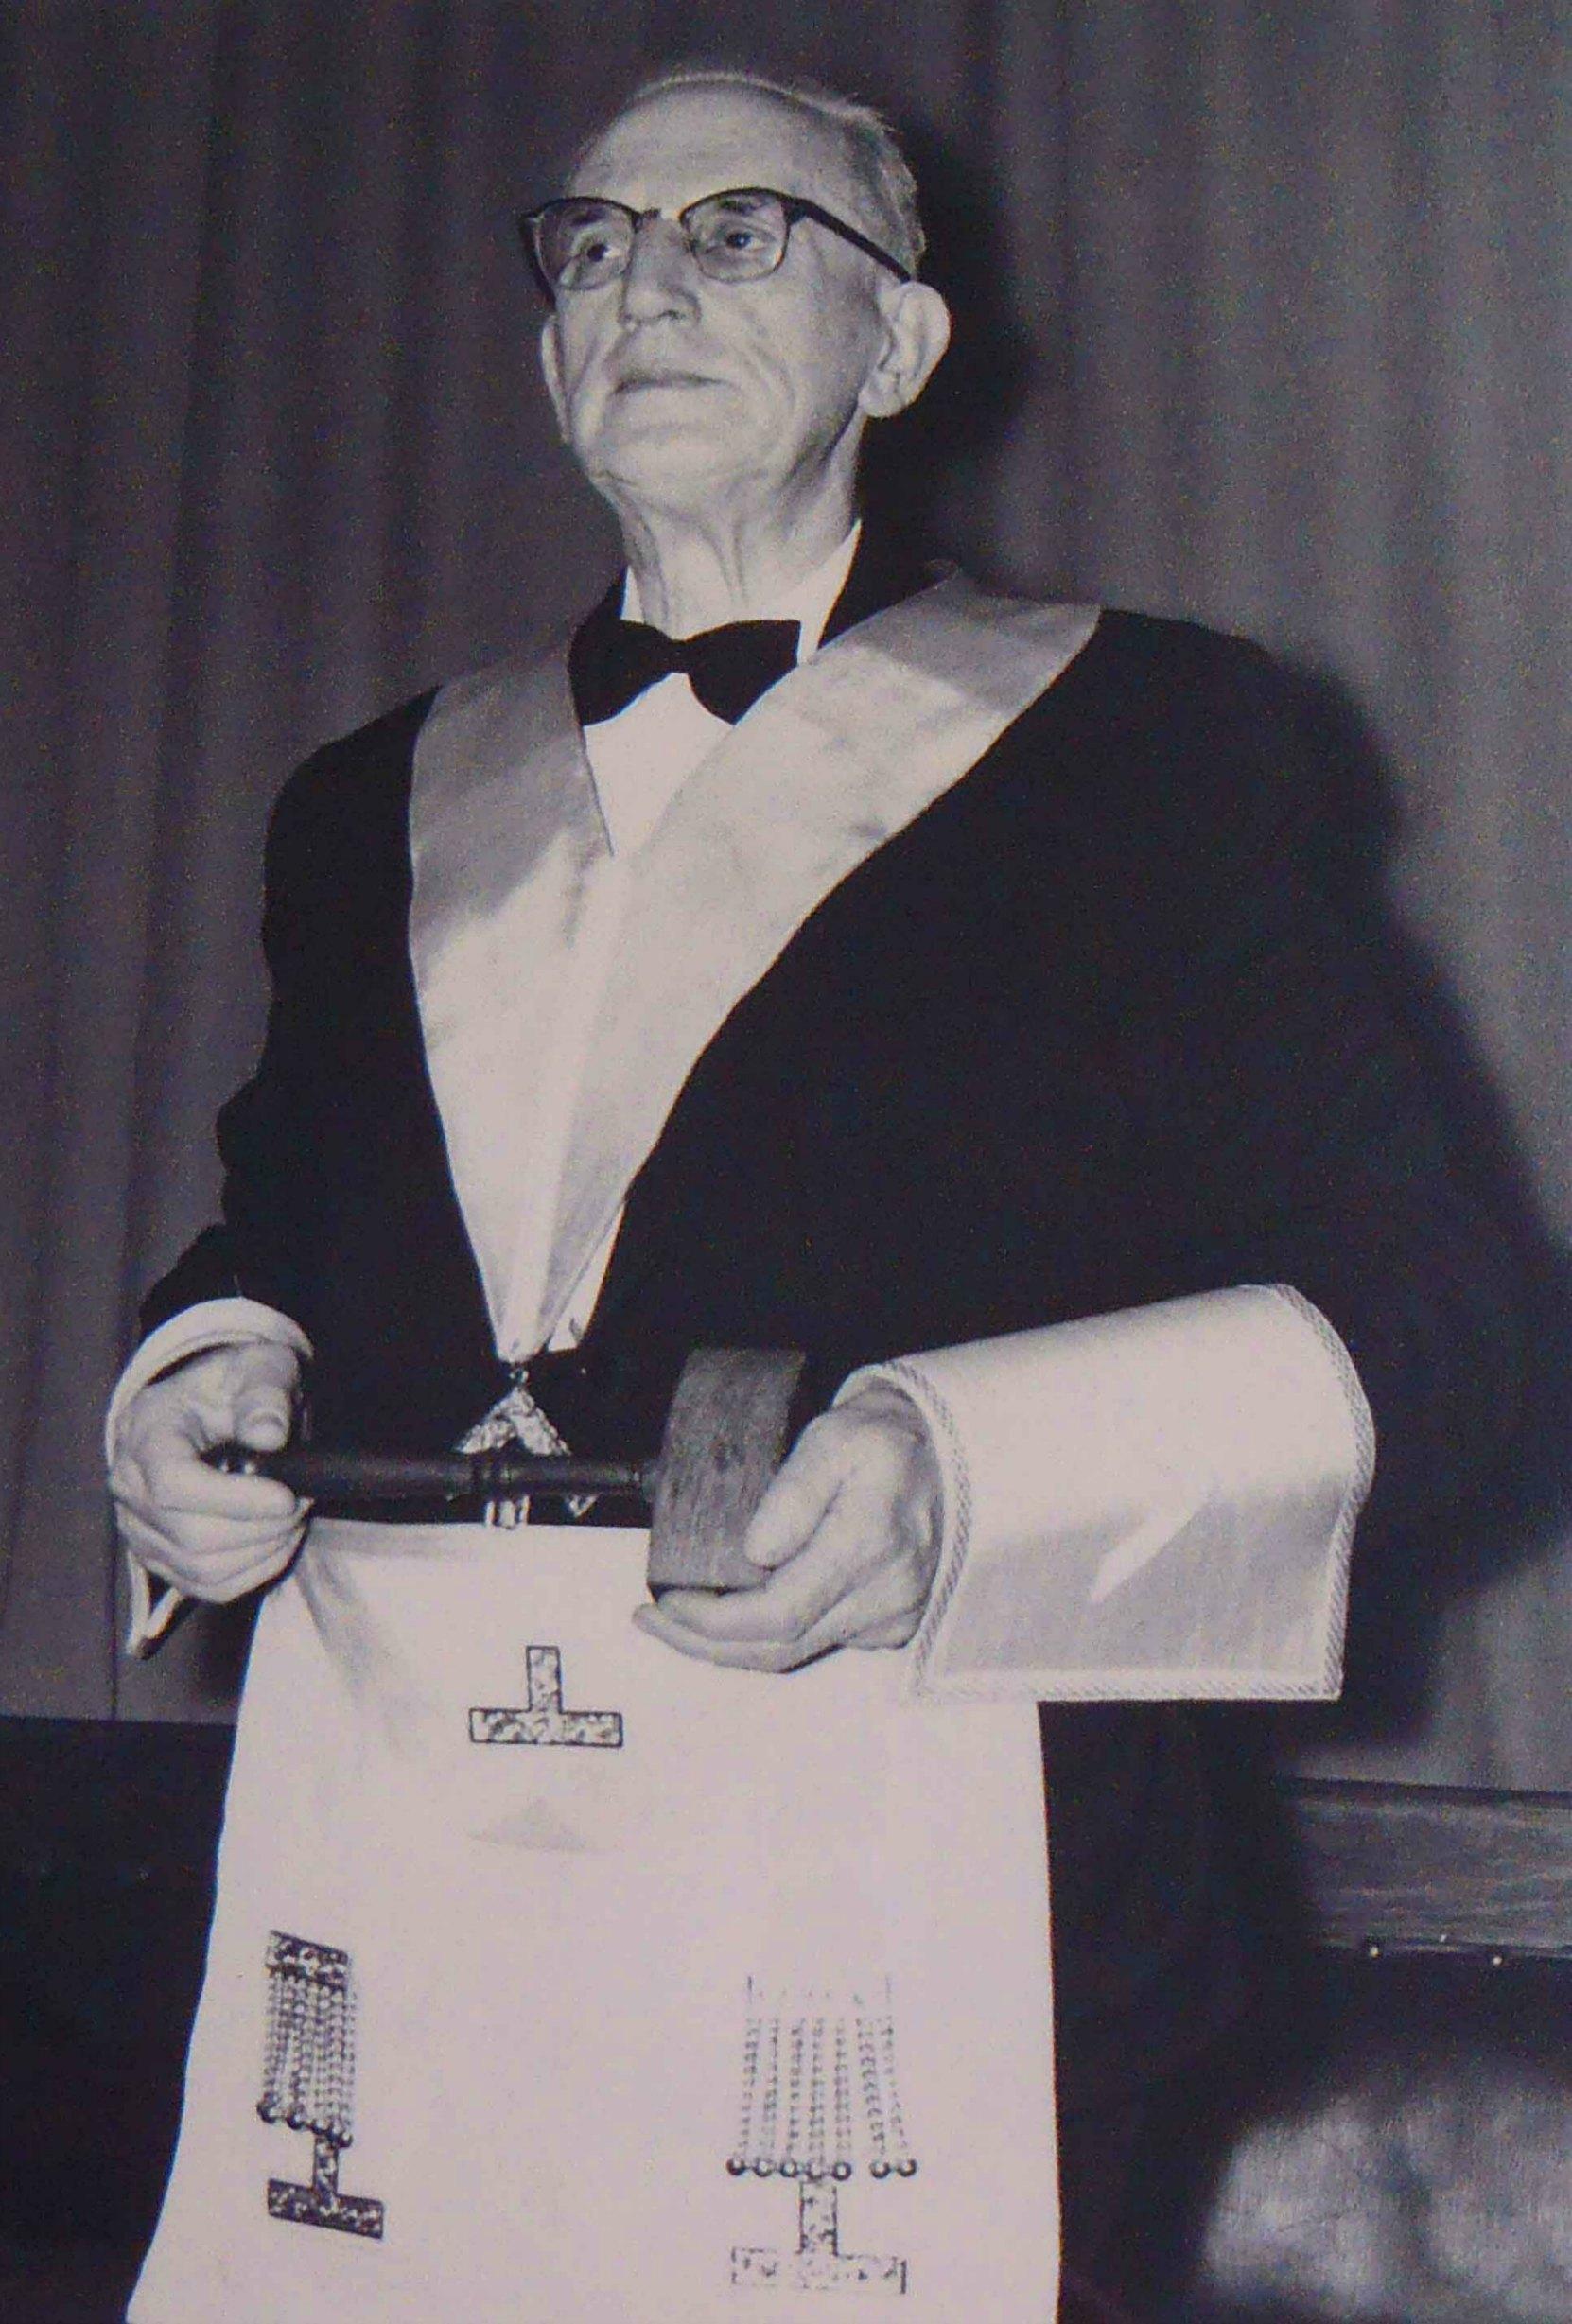 William Bruce Powel, of Powel's Mens' Wear, in Masonic regalia, circa 1958